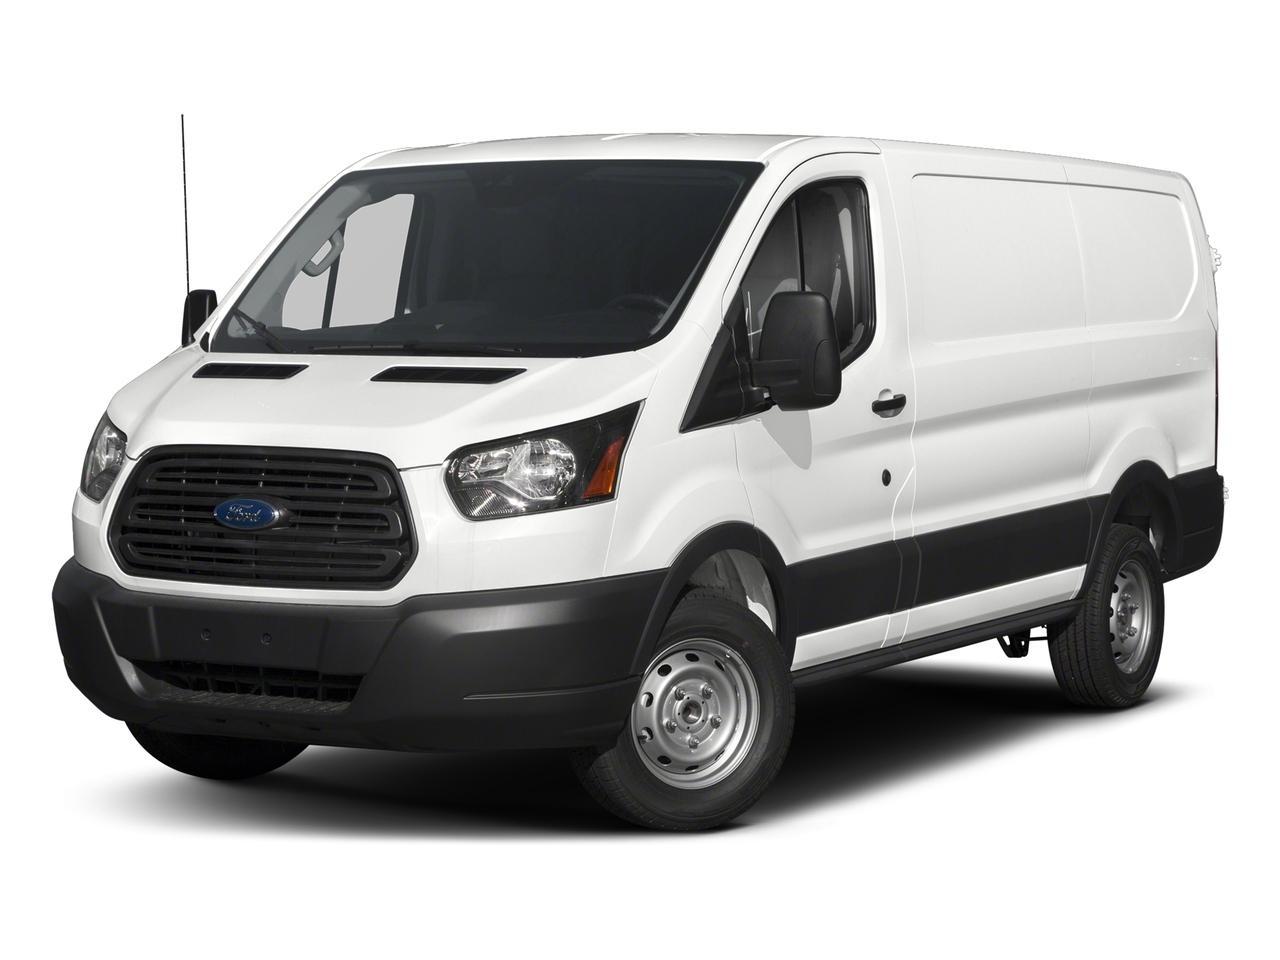 2018 Ford Transit Van Vehicle Photo in Danbury, CT 06810